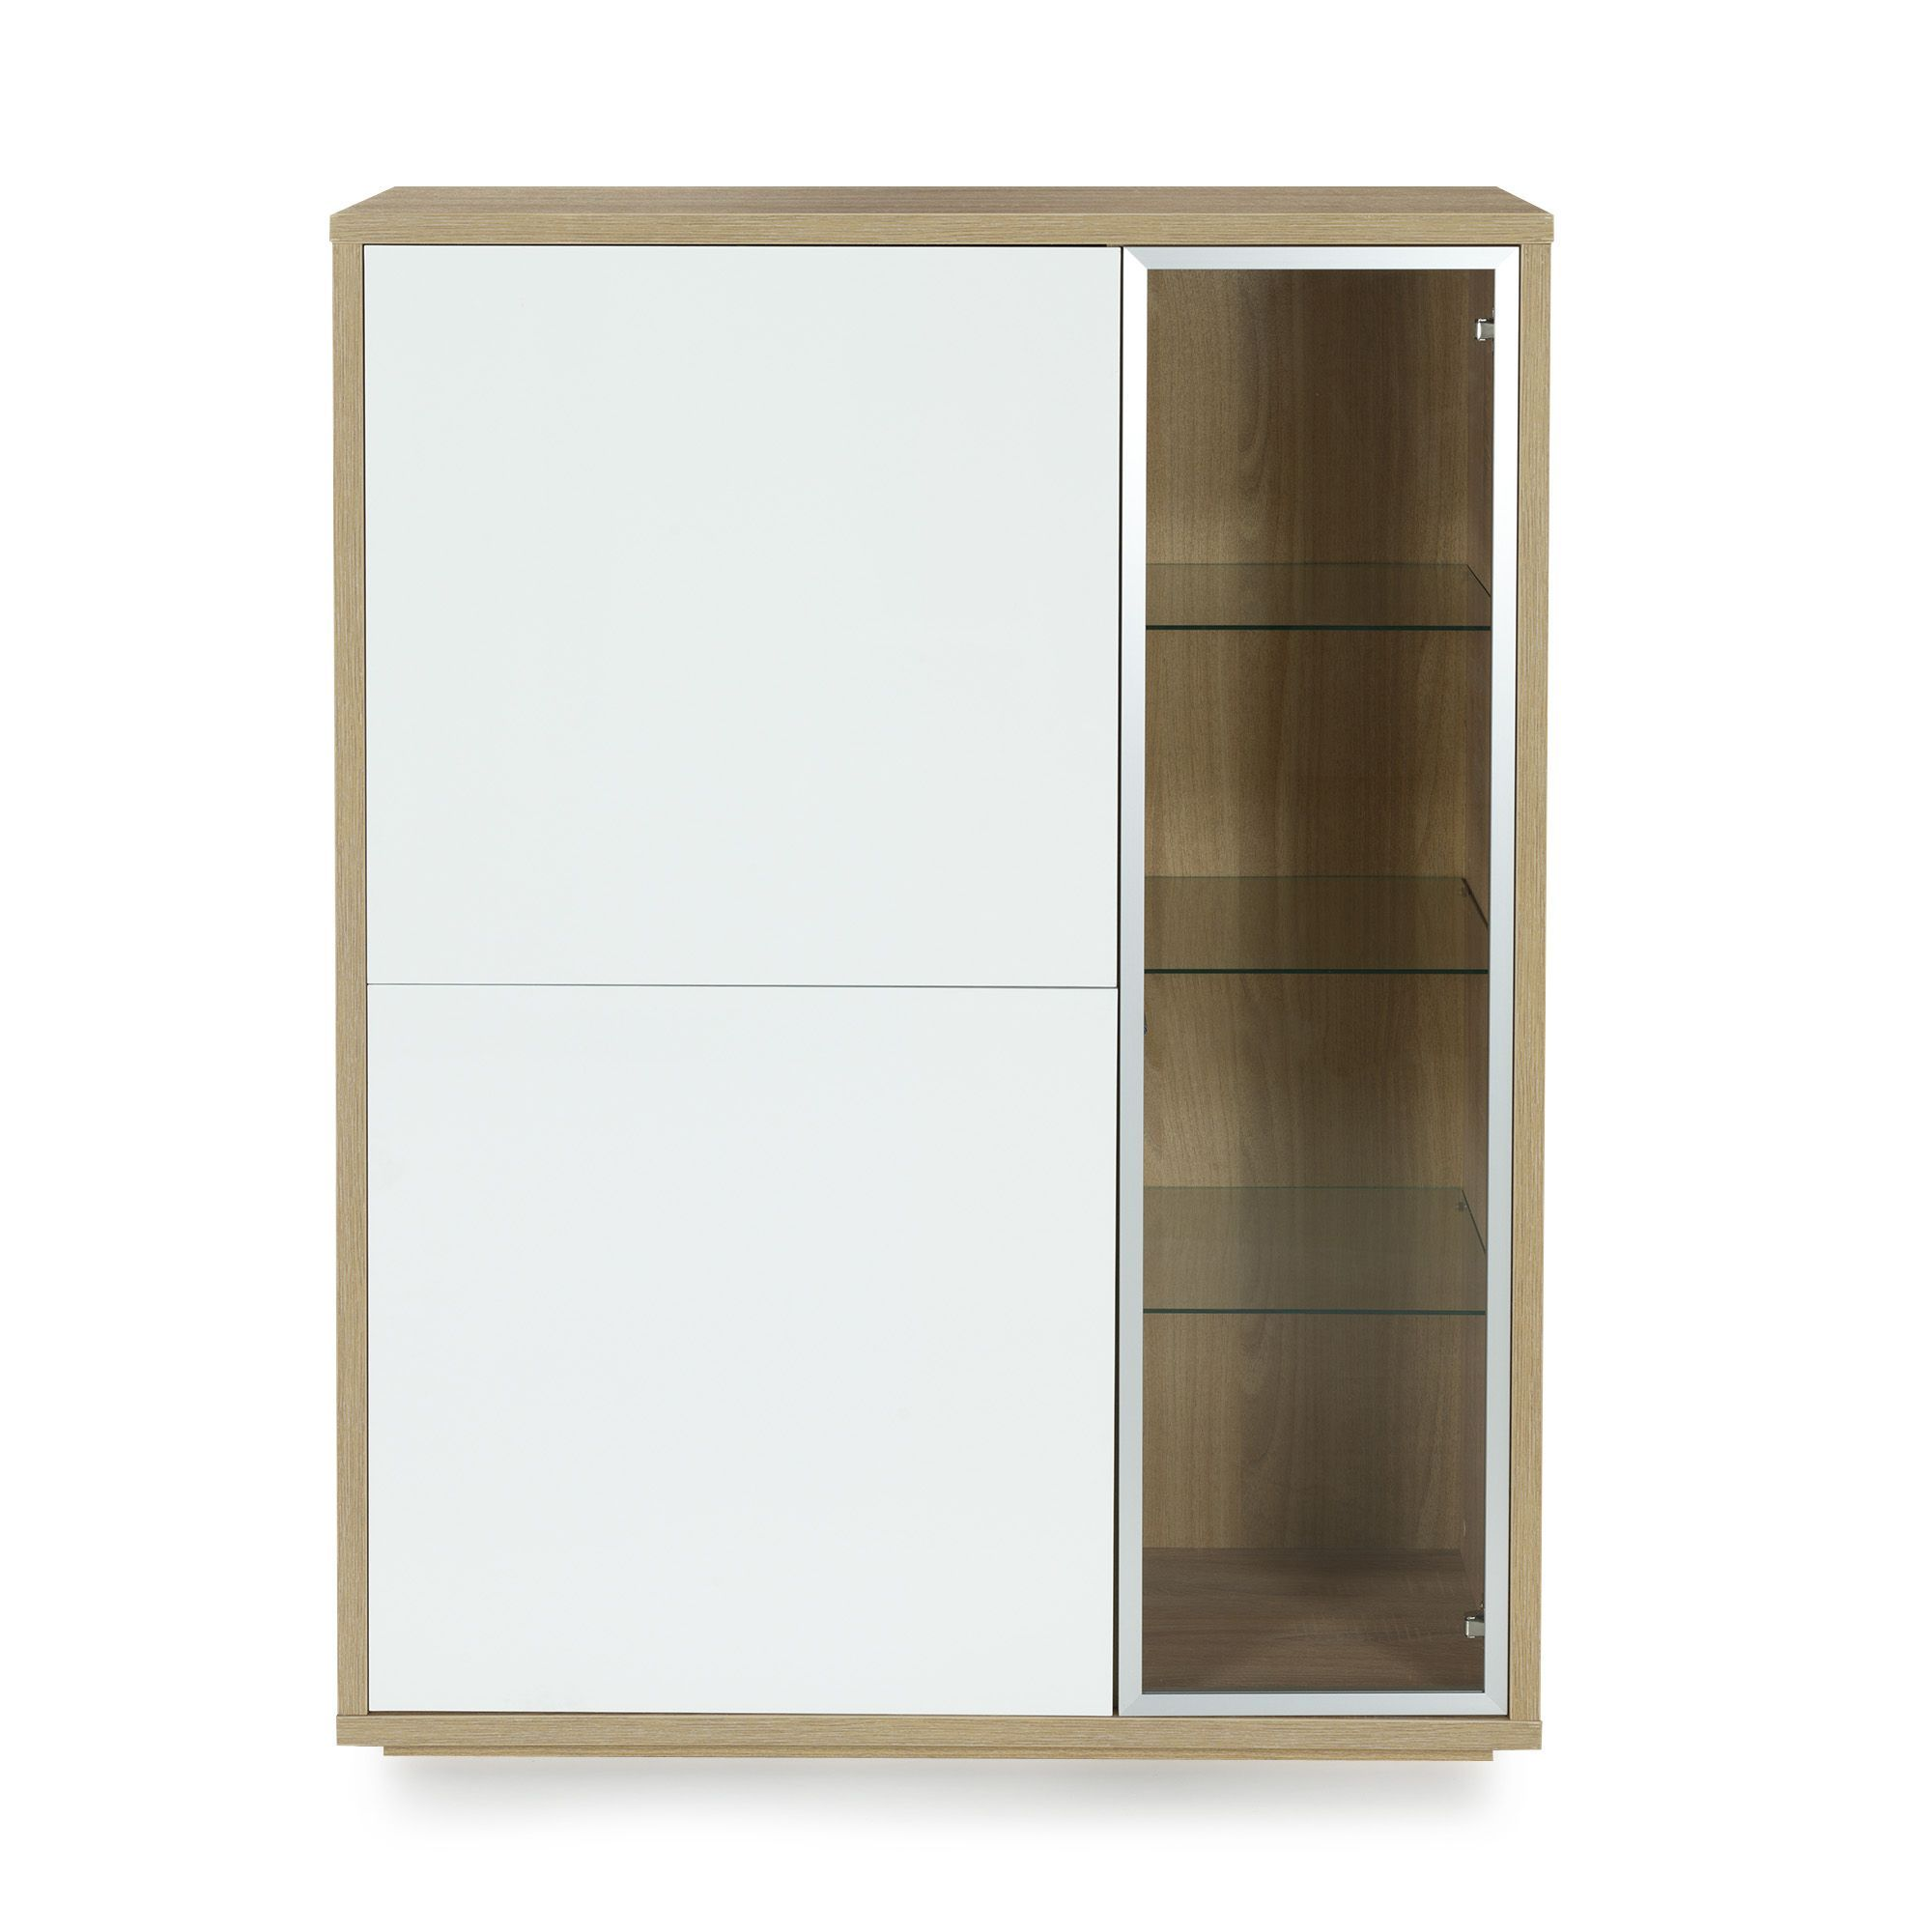 Meuble Vitrine 3 Portes Design Scandinave Imitation Ch Ne Blanc  # Meuble Tv Chene Blanc Scandinave